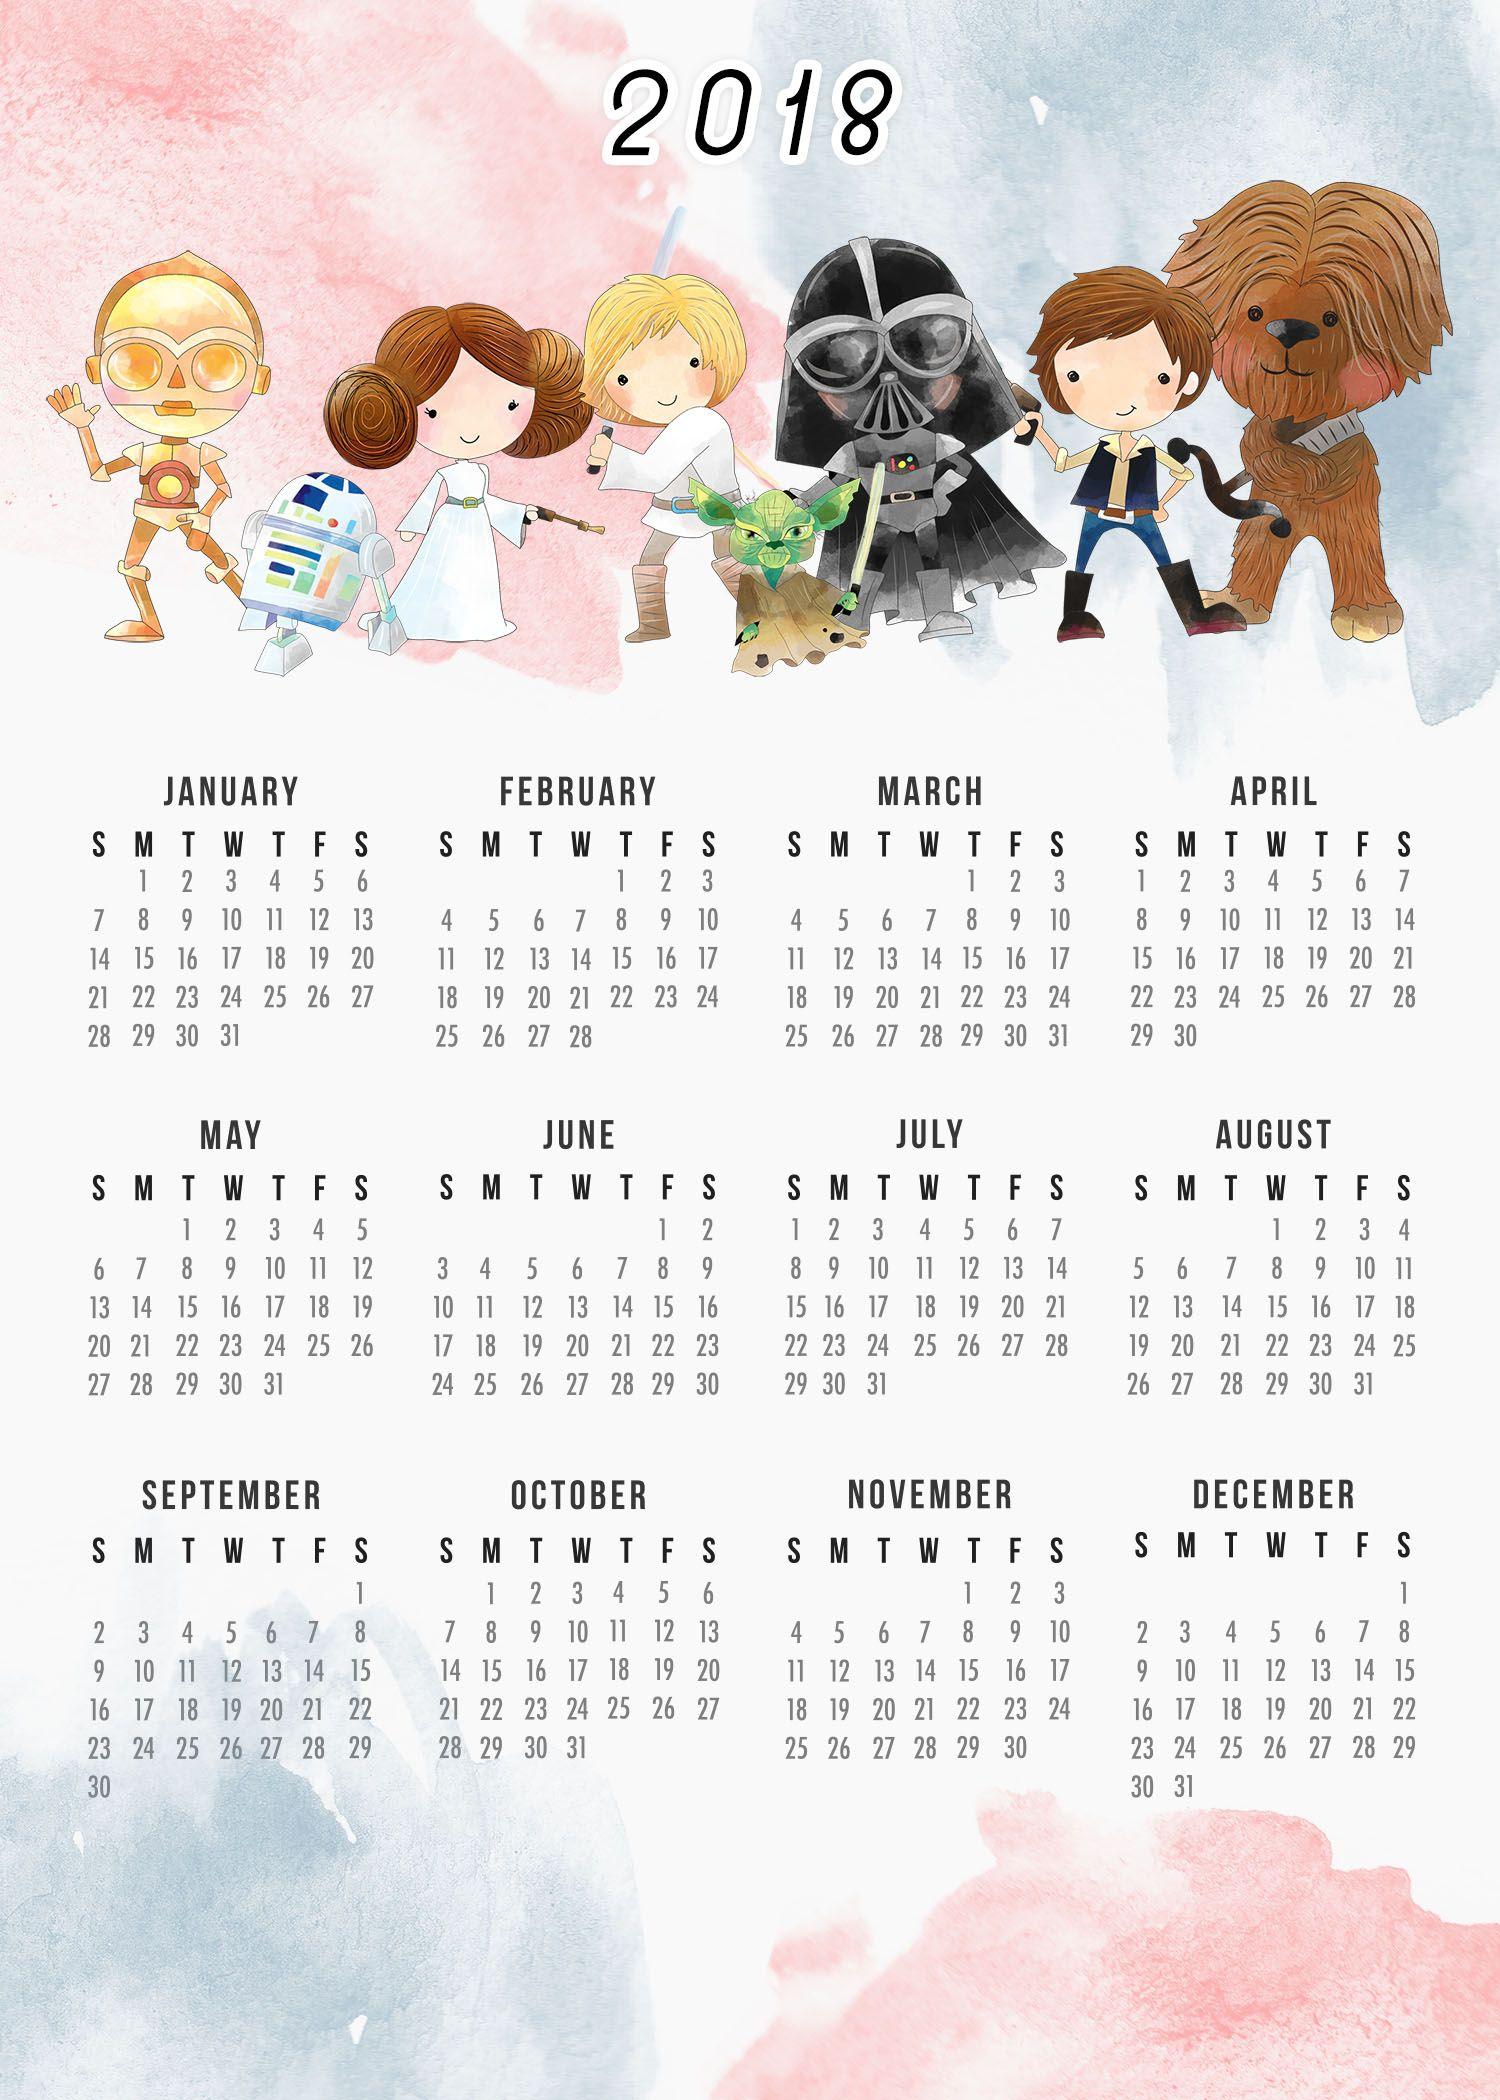 Free Printable 2018 Star Wars Calendar The Cottage Market